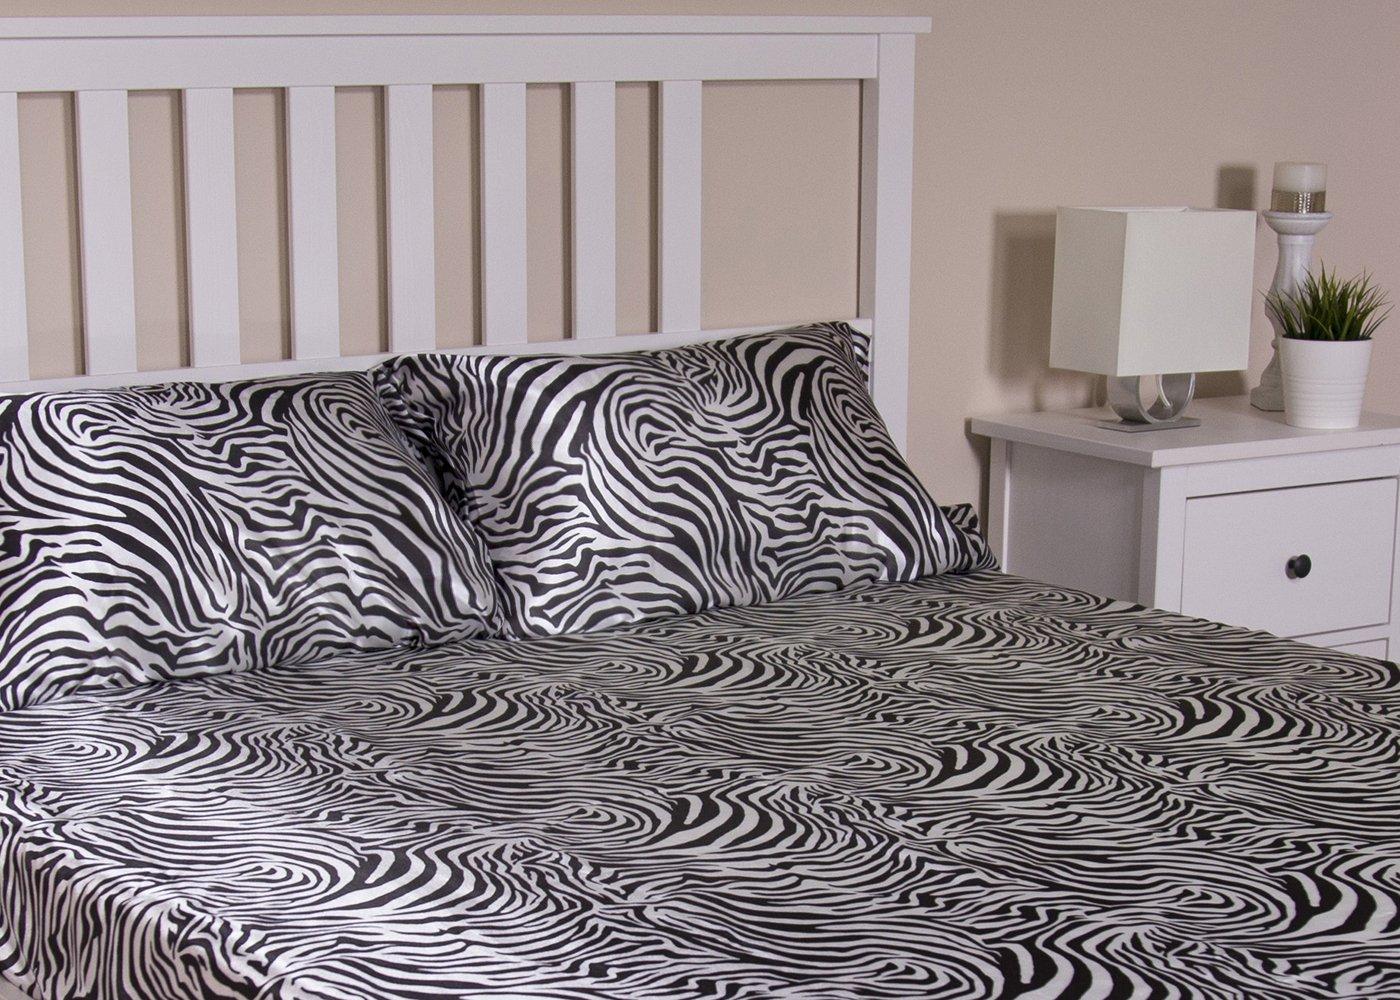 HONEYMOON HOME FASHIONS Queen Sheet Set Luxury Silkily Like Satin Bed Sheets, Zebra by HONEYMOON HOME FASHIONS (Image #2)